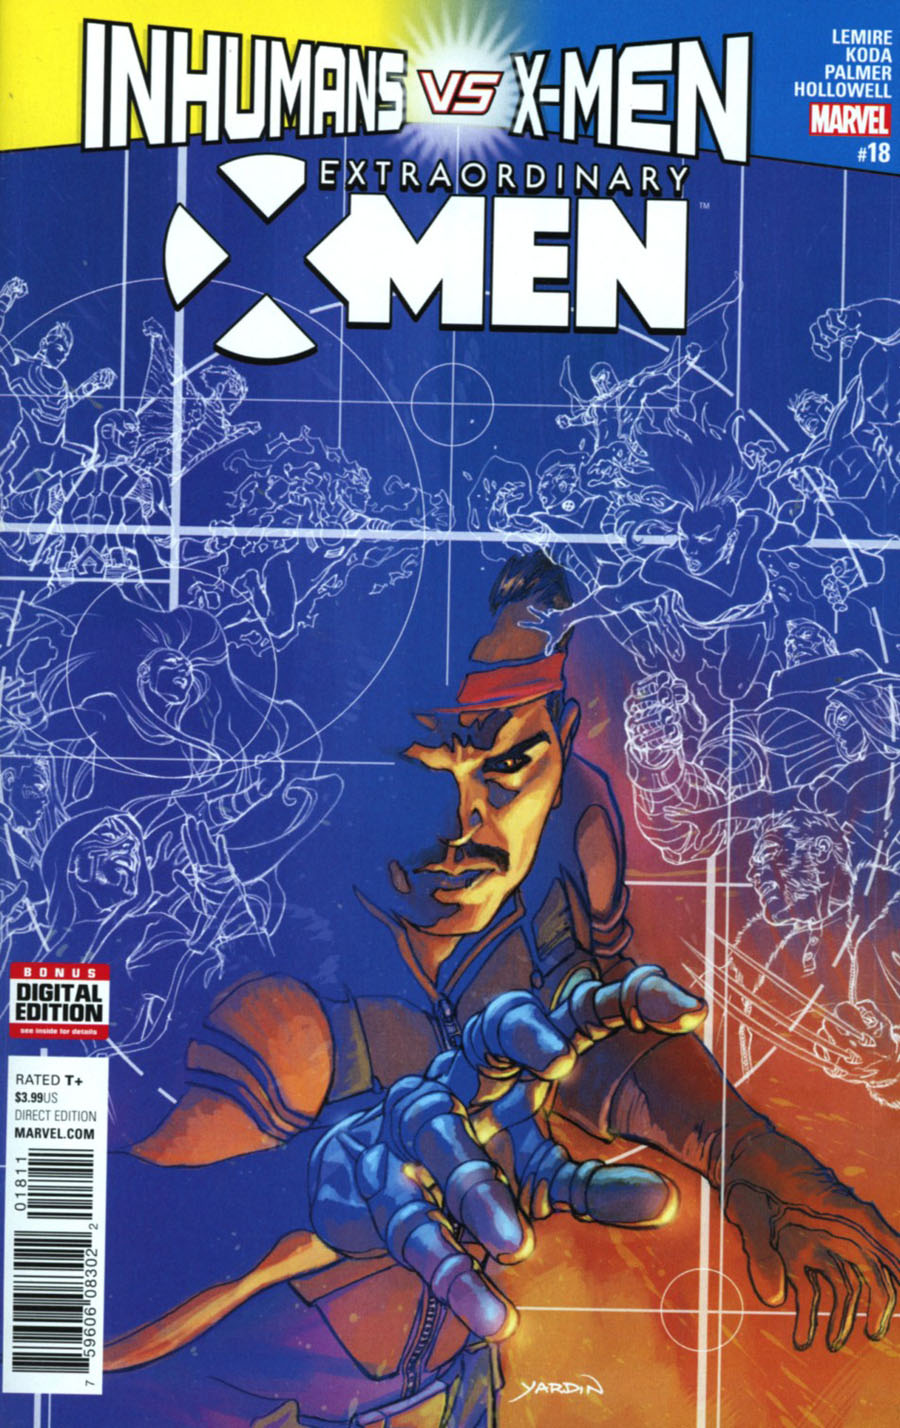 Extraordinary X-Men #18 Cover A Regular David Yardin Cover (Inhumans vs X-Men Tie-In)